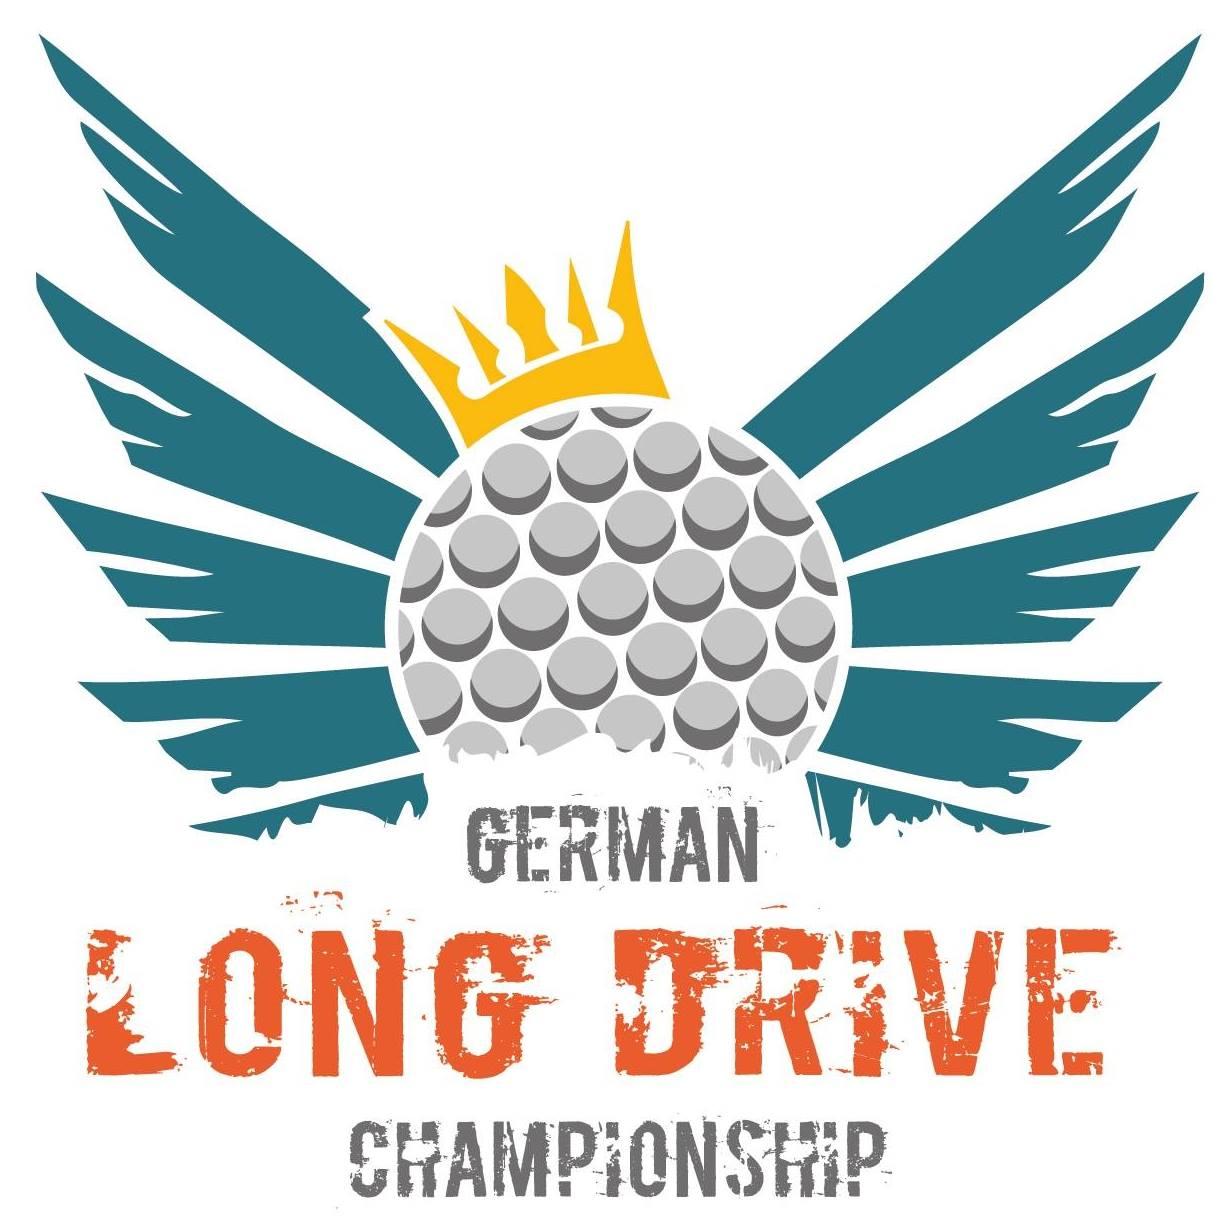 Auf zur Long Drive Championship